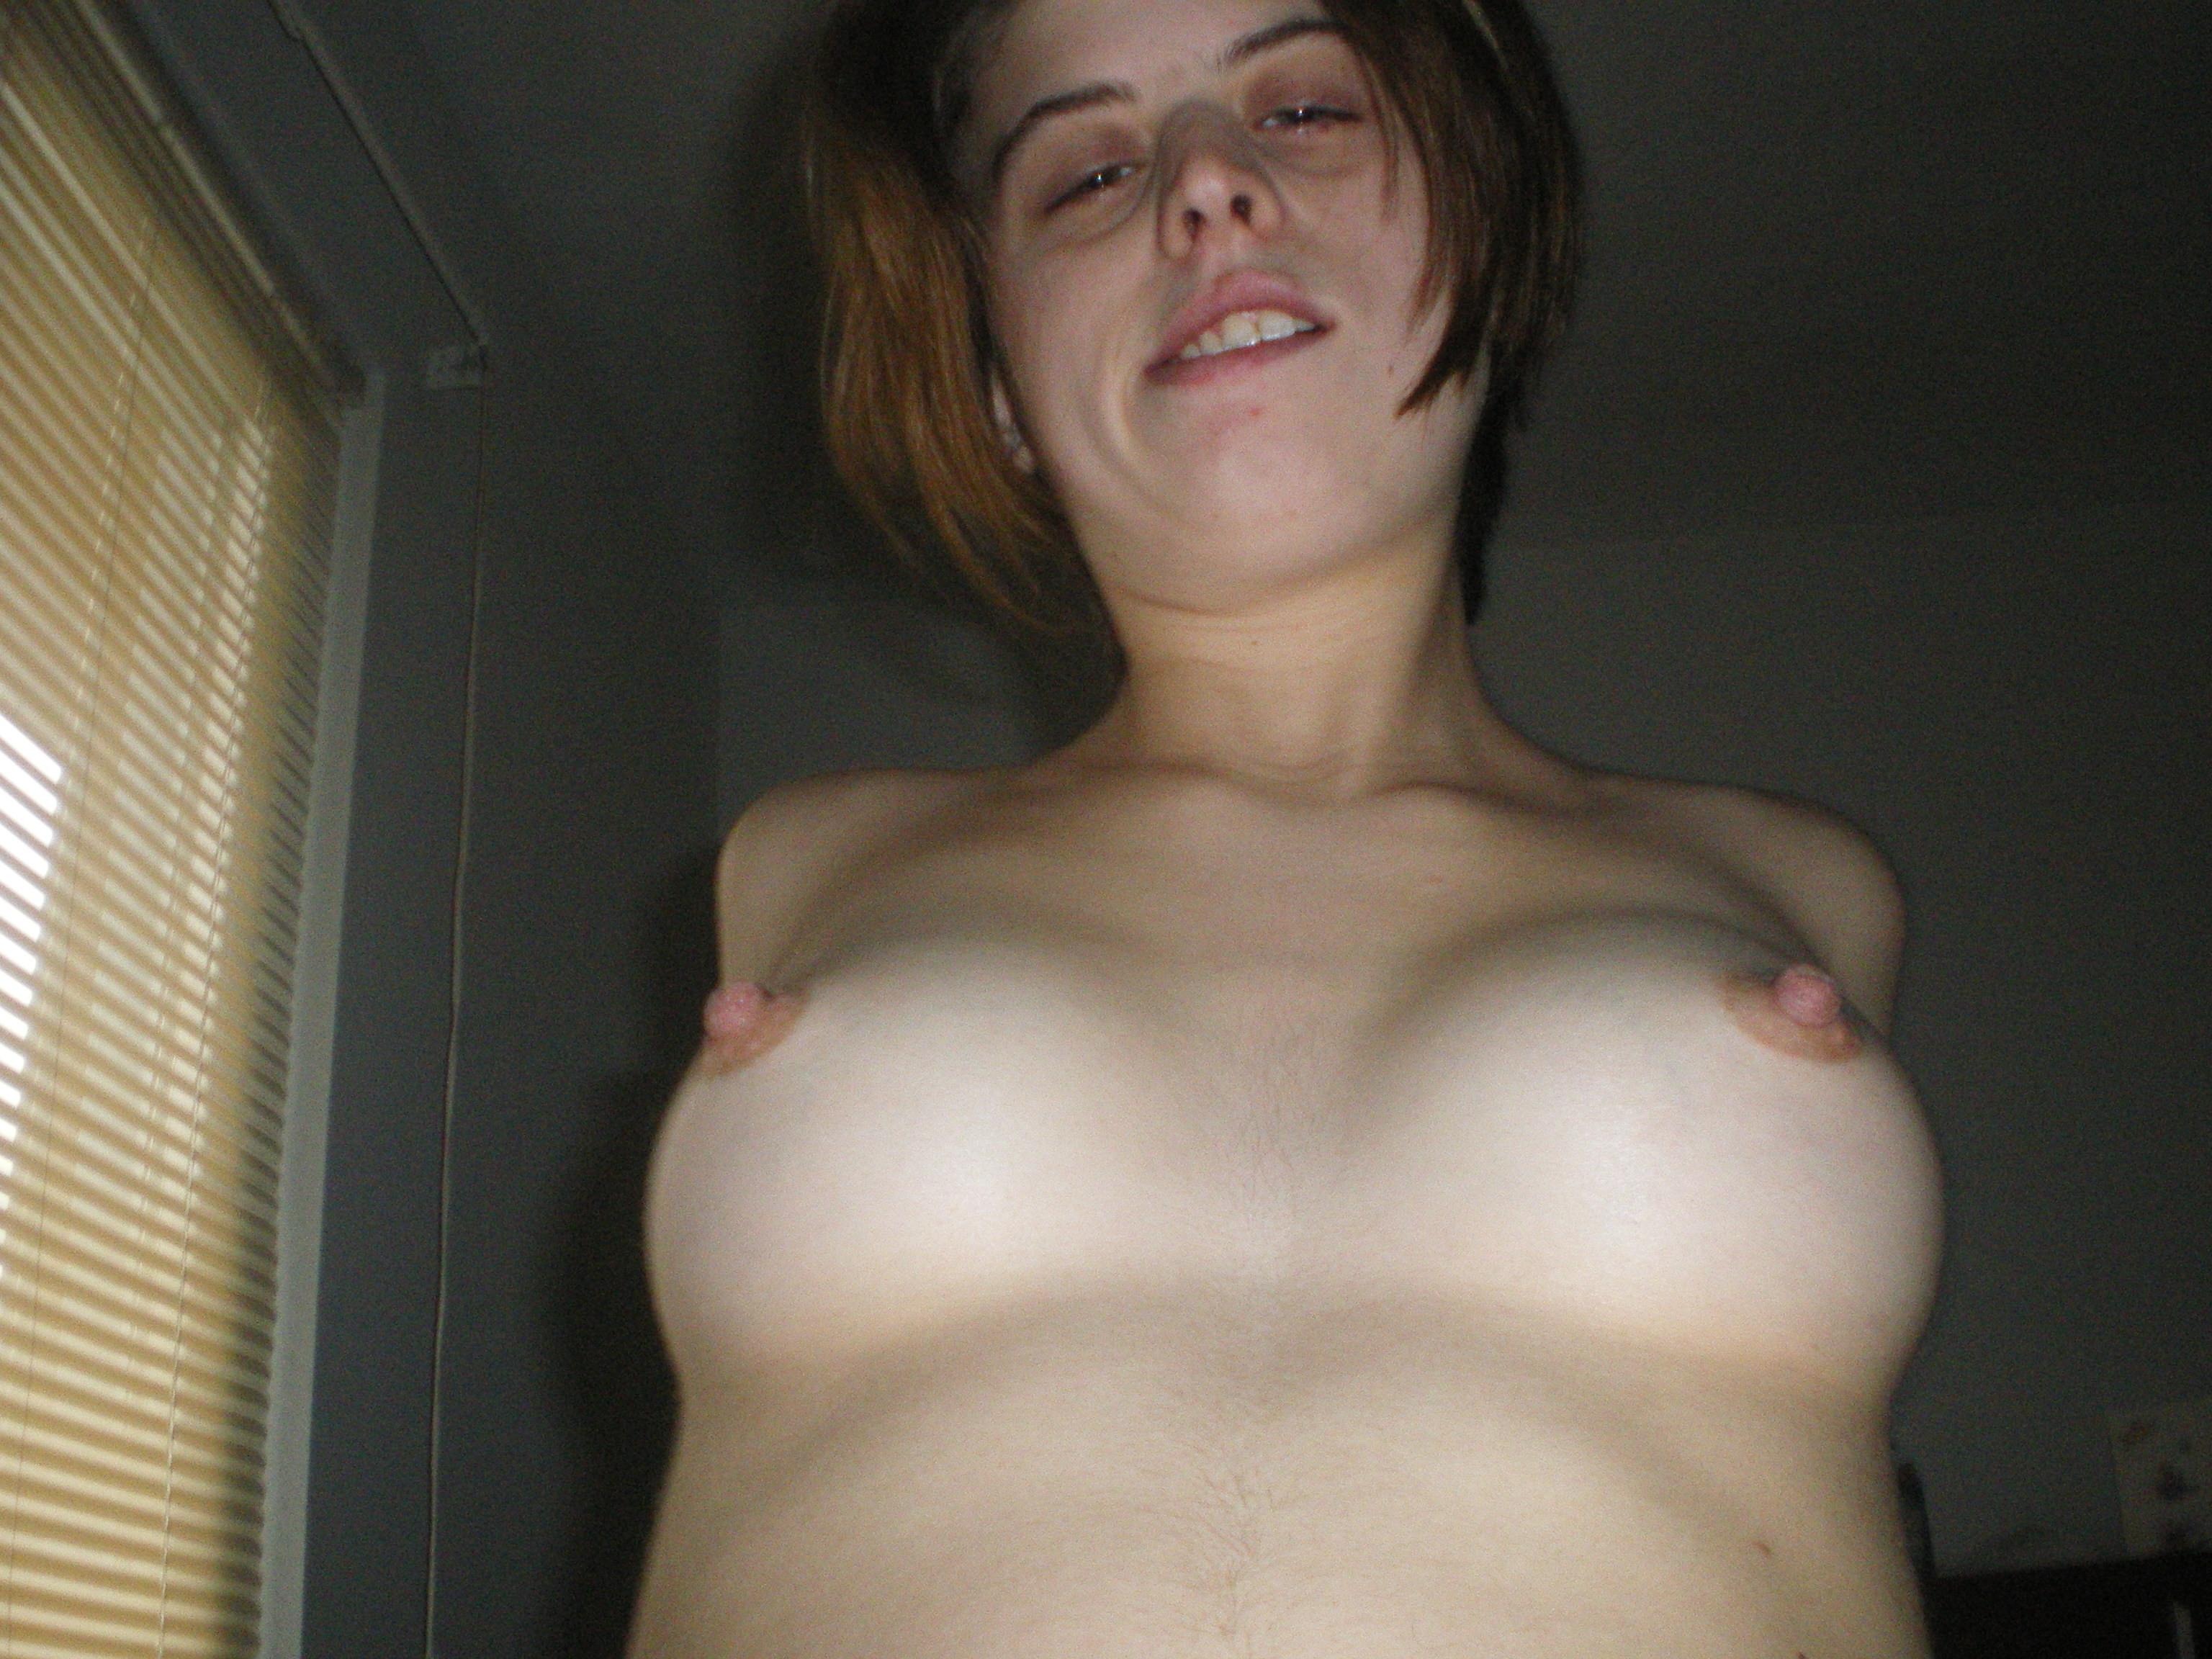 Sex High Amateur School School girl